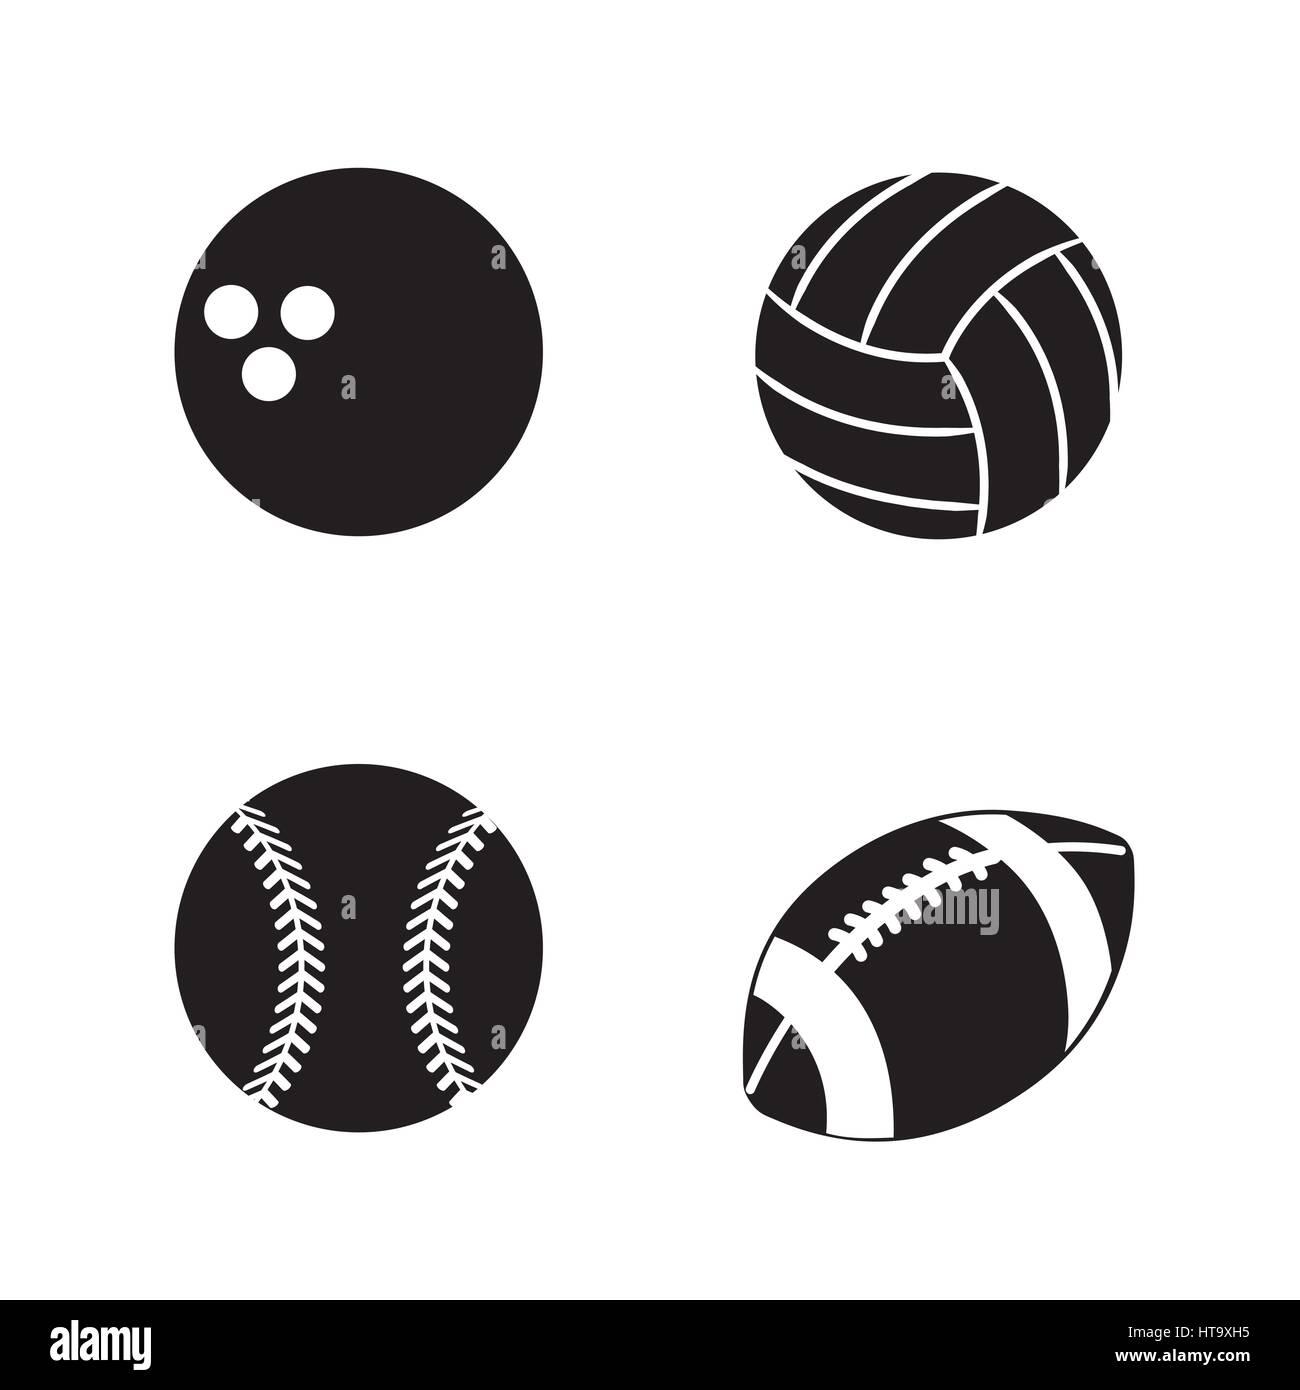 contour diferents plays balls icon - Stock Image